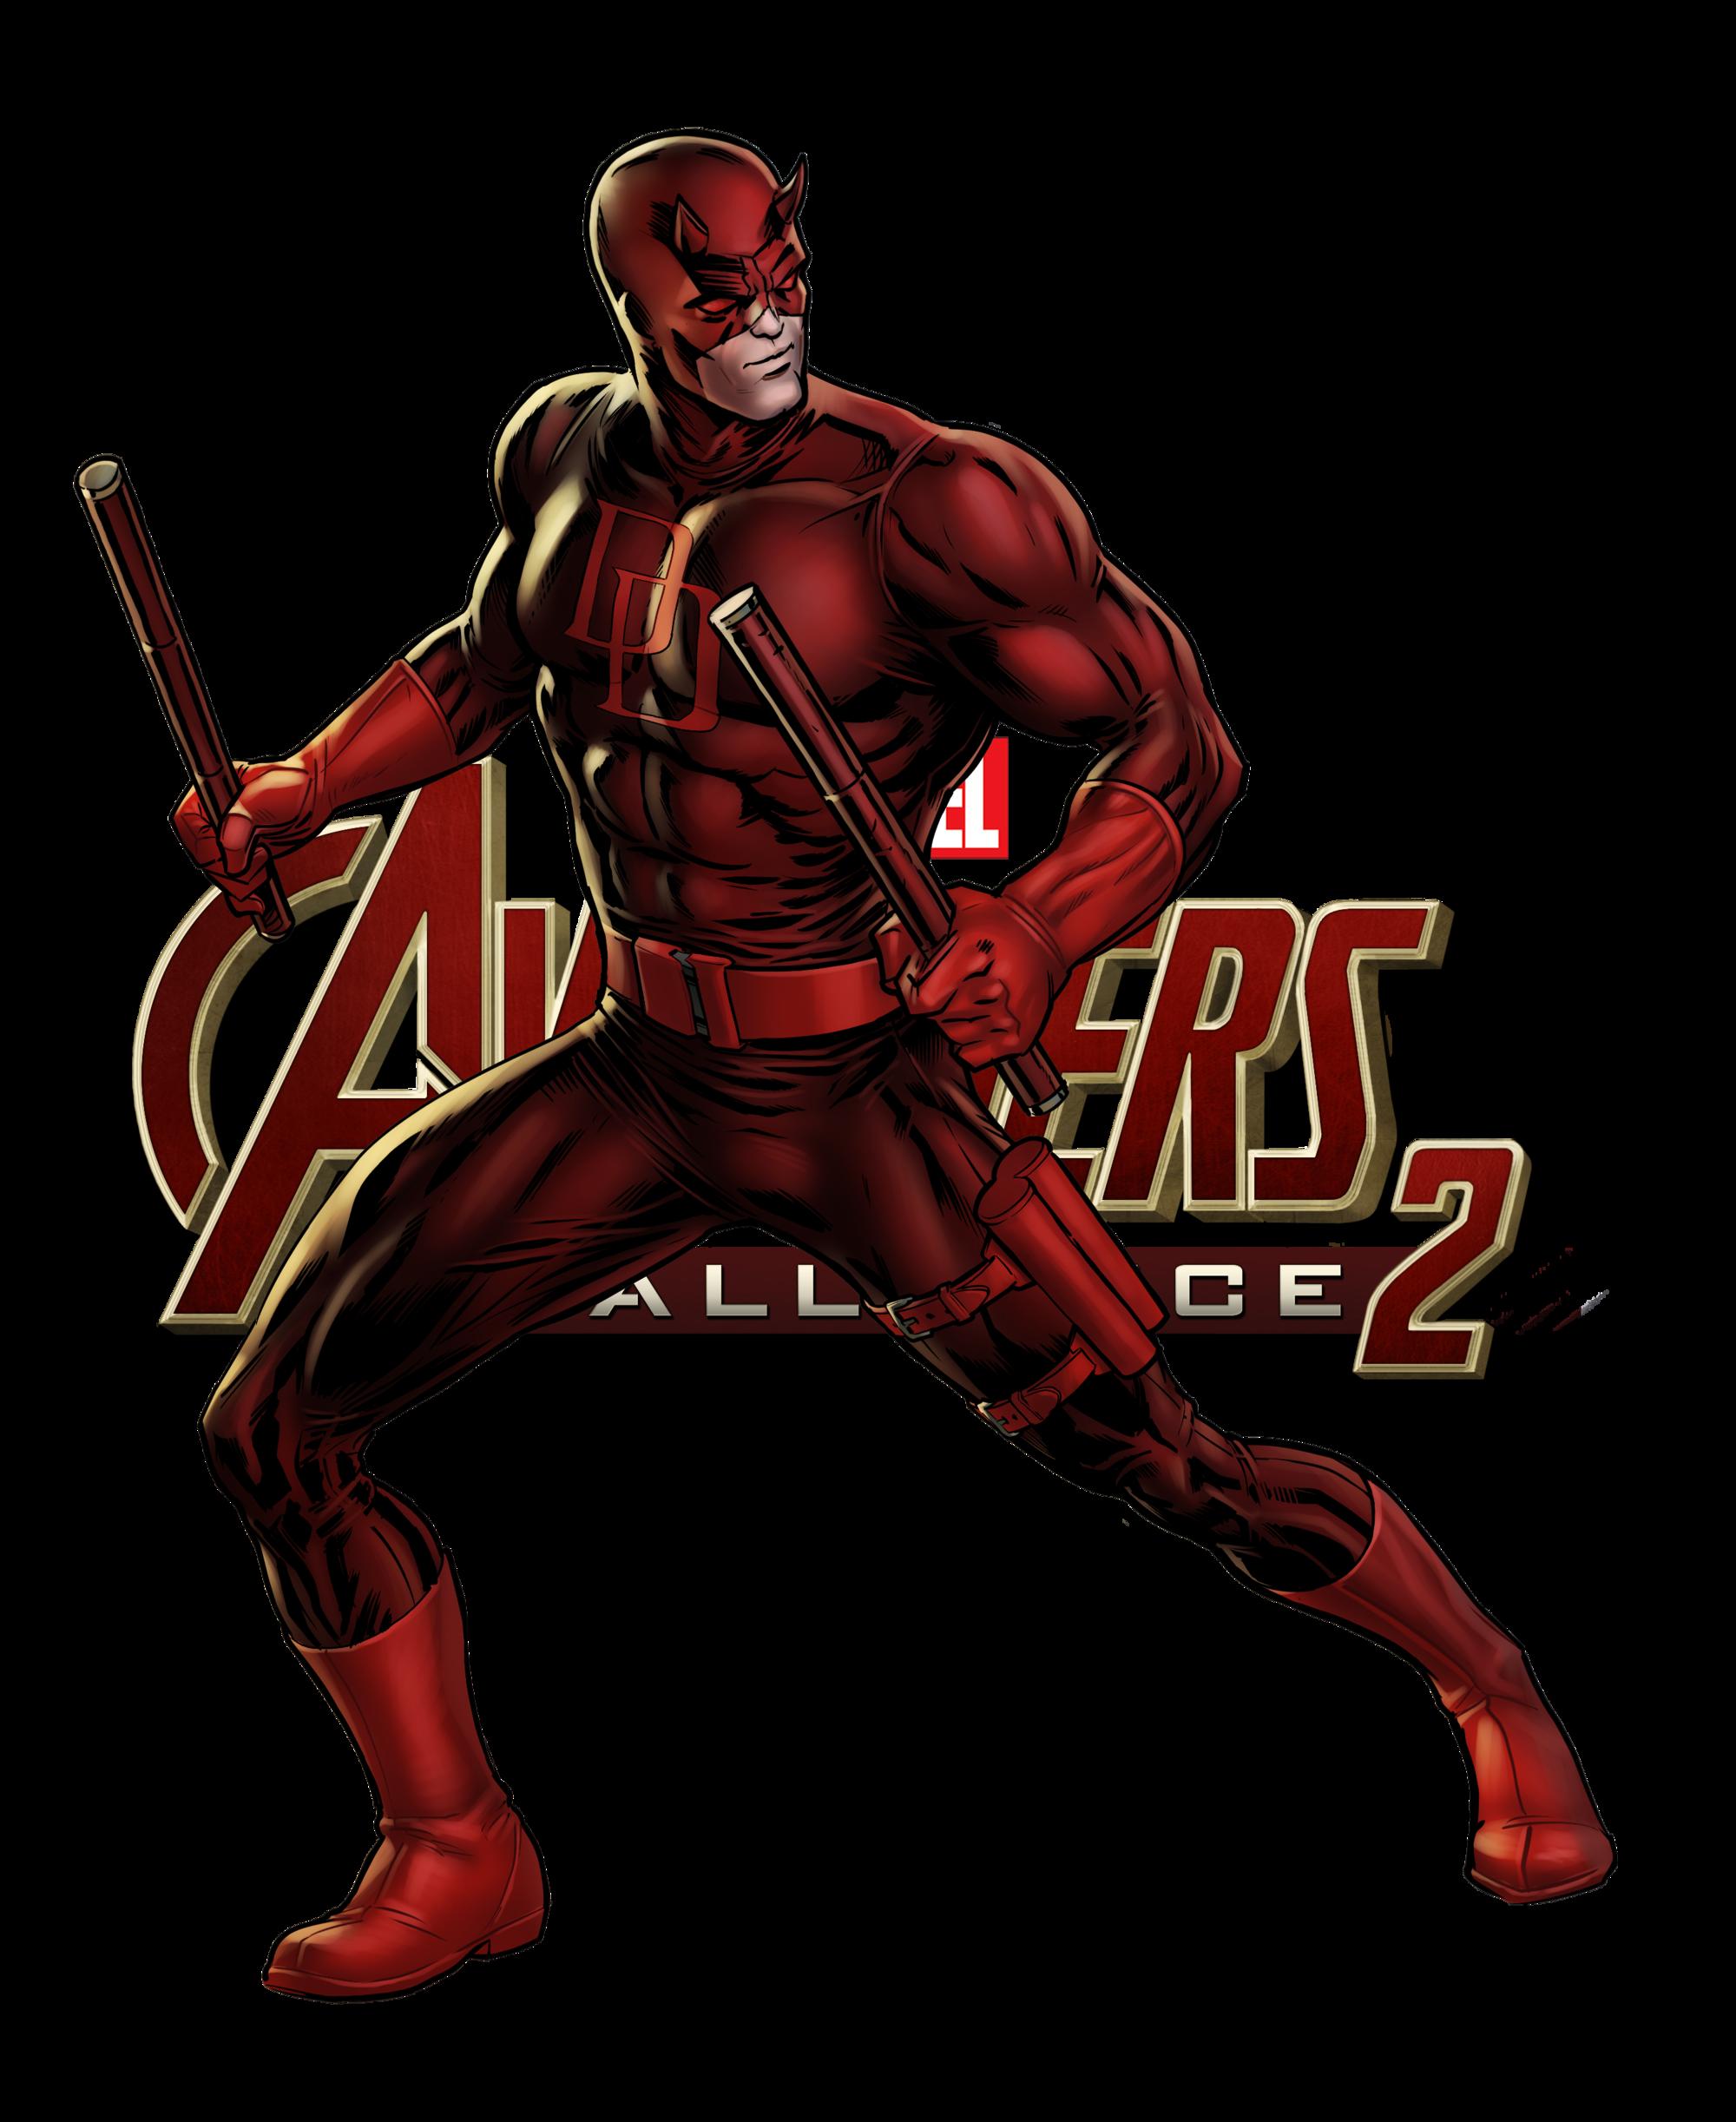 image download Marvel avengers alliance captain. Blindfold drawing daredevil